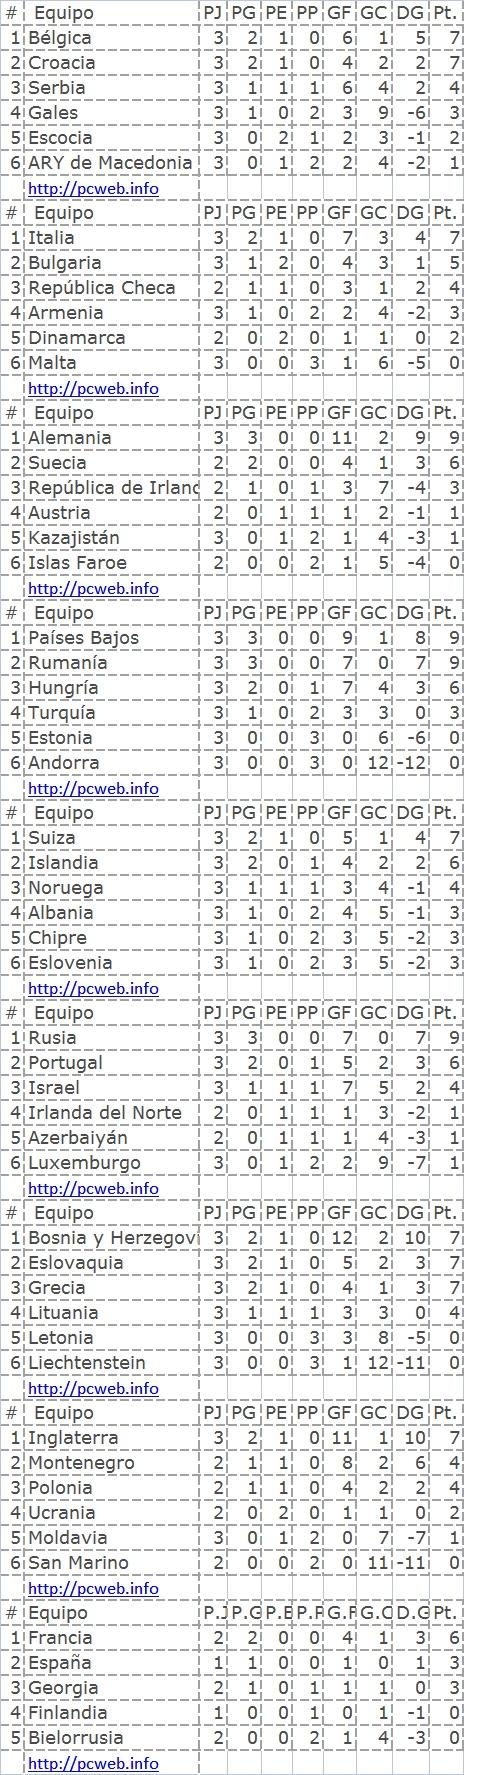 Grupos de la uefa eliminatorias Brasil 2014